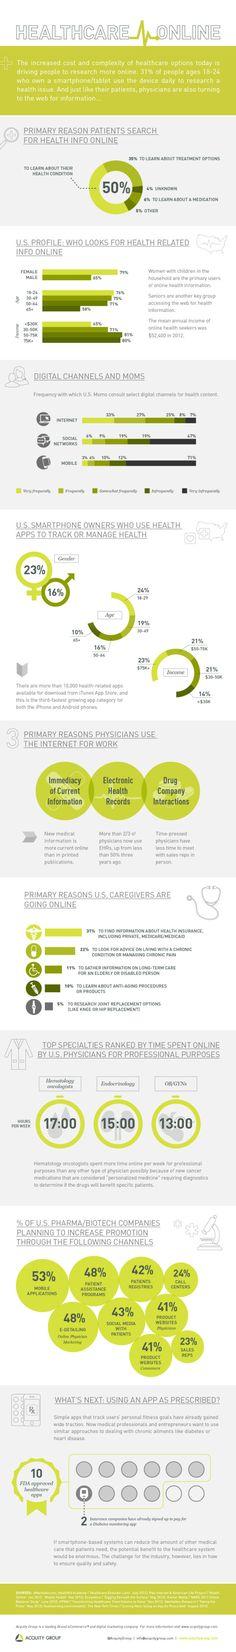 Wow. #health #wellness #infographics #loseweight #diet #detox #vitamins #supplements  http://www.bewellandwealthy.org